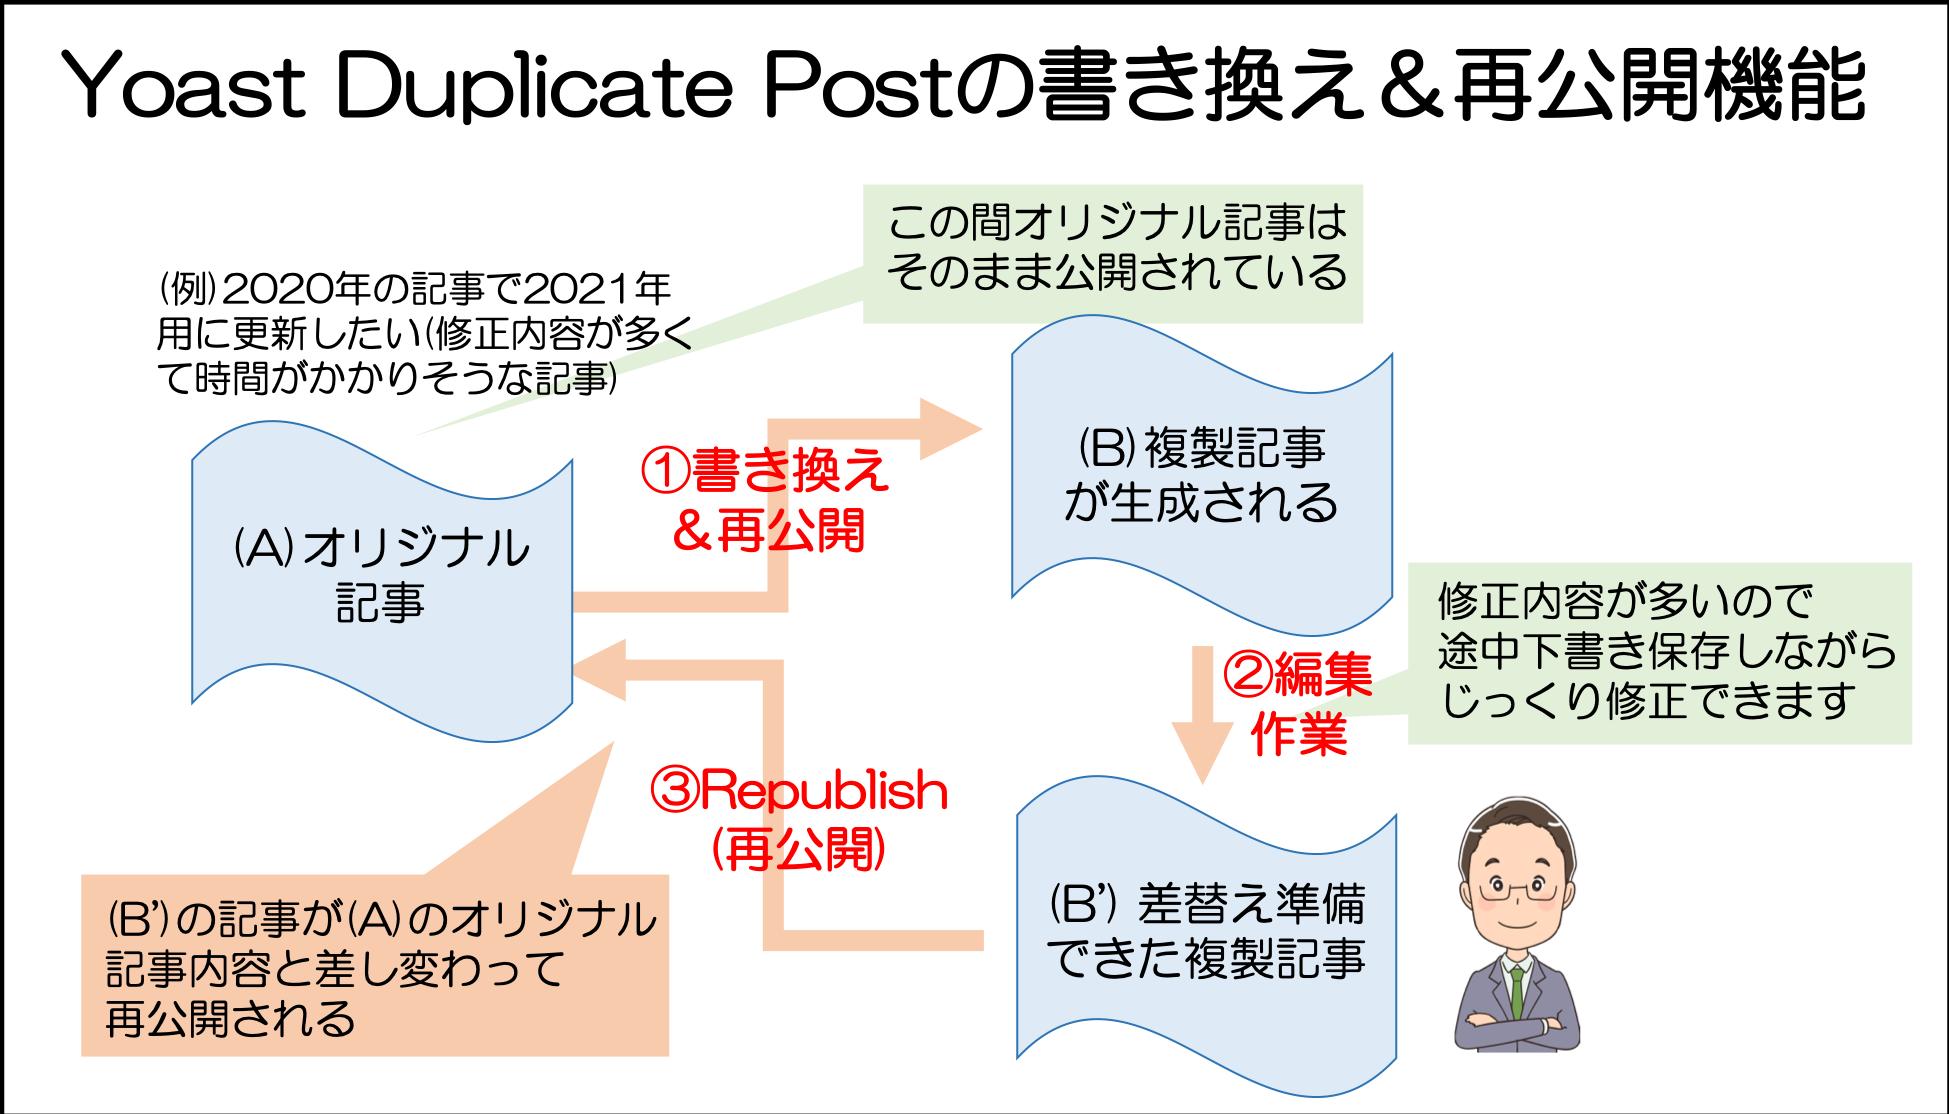 Yoast Duplicate Postの書き換え&再公開機能